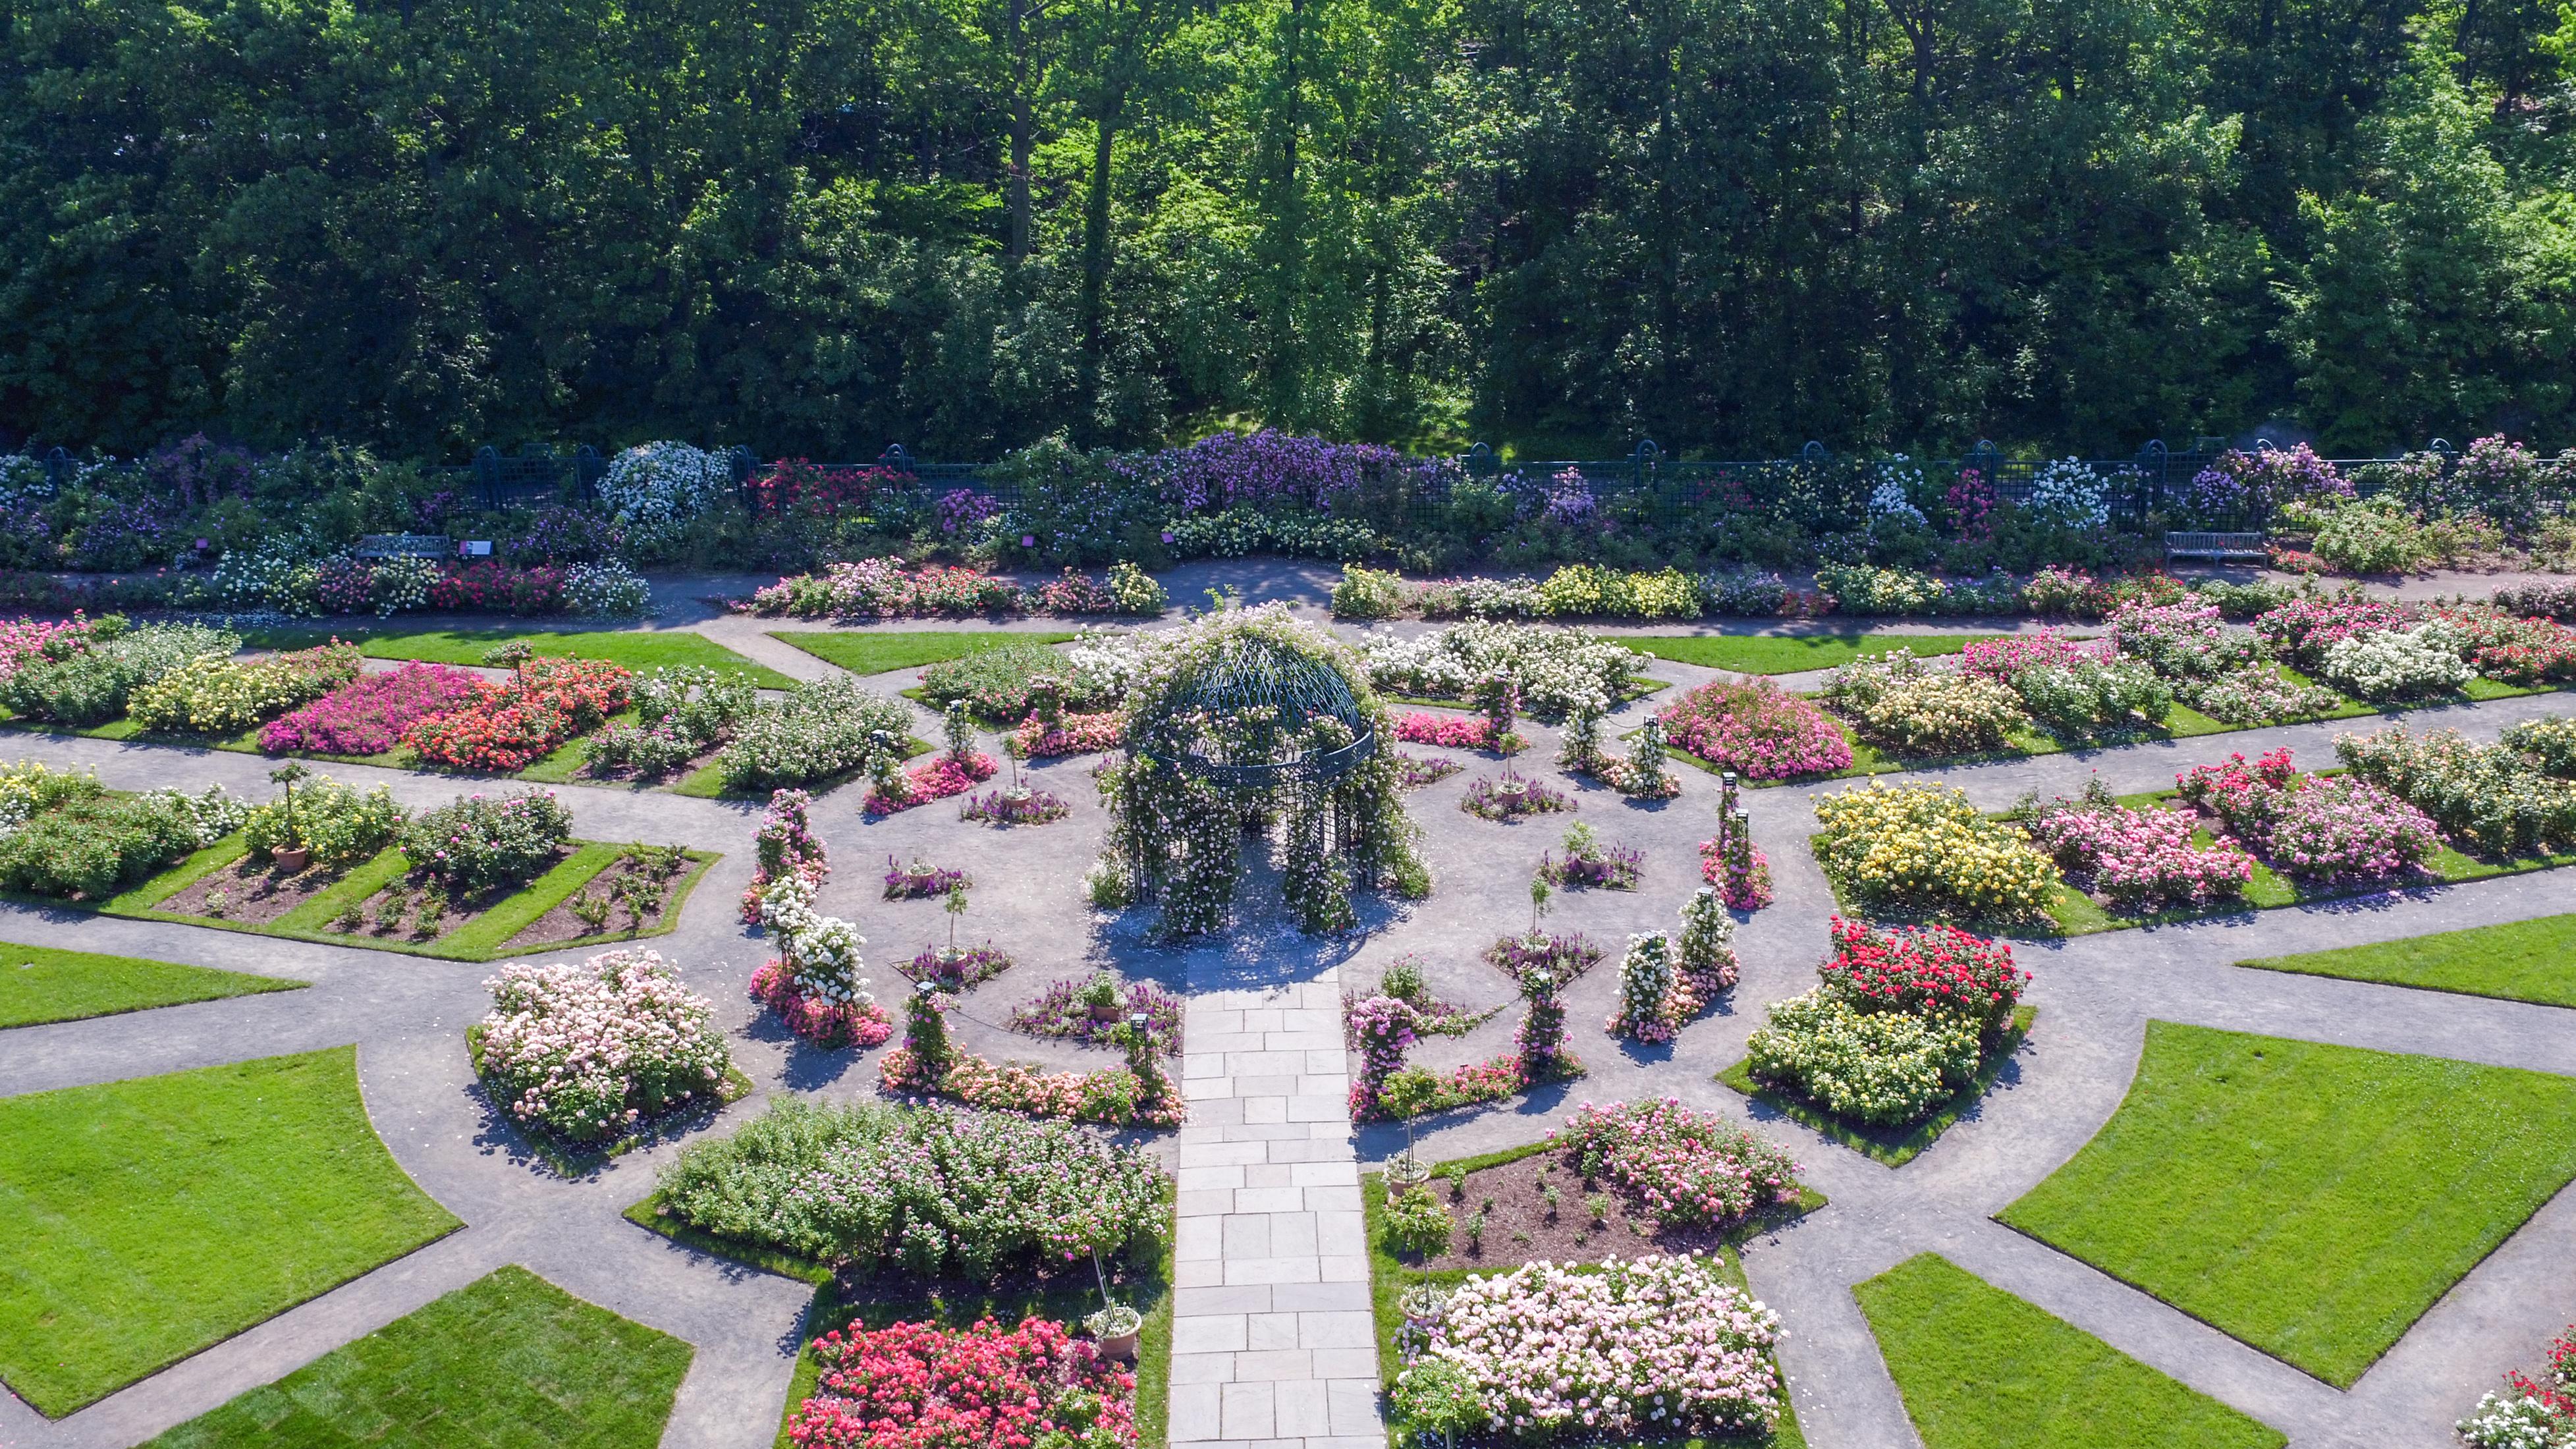 General Nybg Image Gallery » New York Botanical Garden concernant Opbouw Tuinhuis Gardenas New York